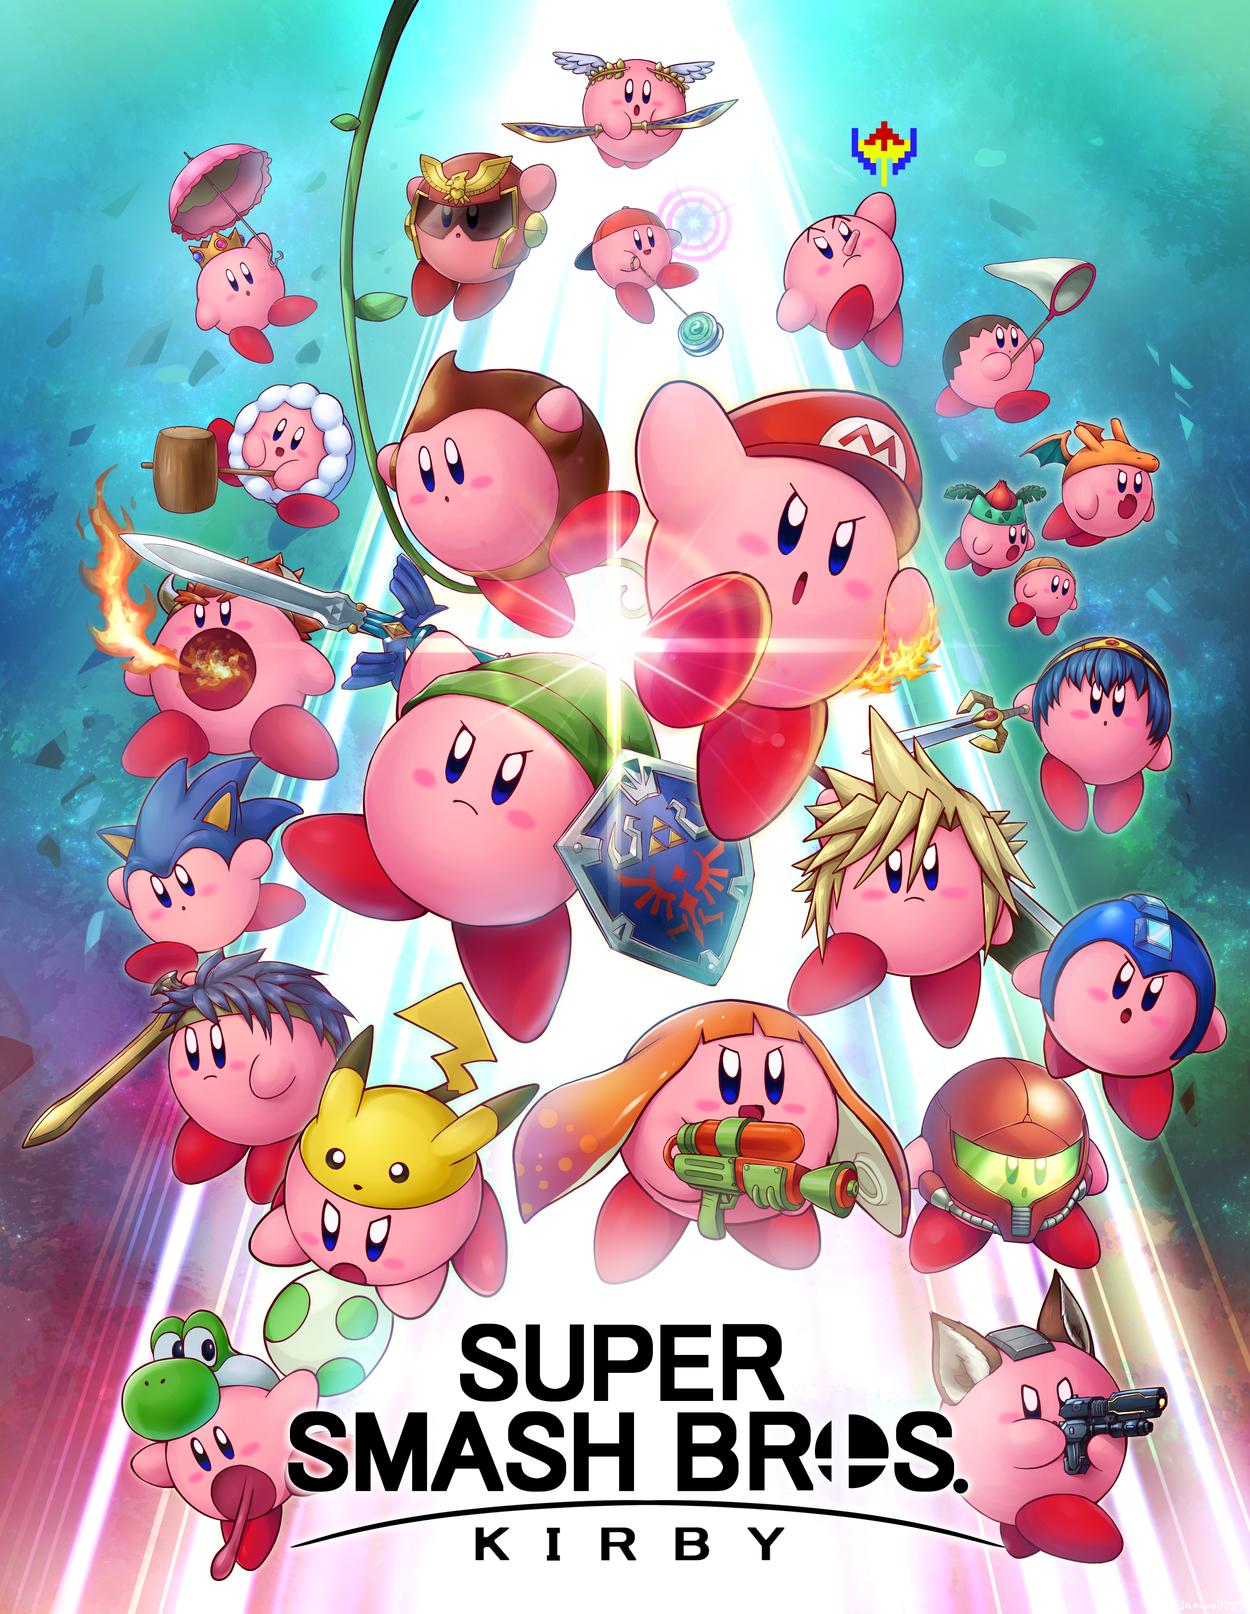 Super Smash Bros Kirby Super Smash Brothers Ultimate Nintendo Super Smash Bros Super Smash Bros Memes Super Smash Bros Brawl